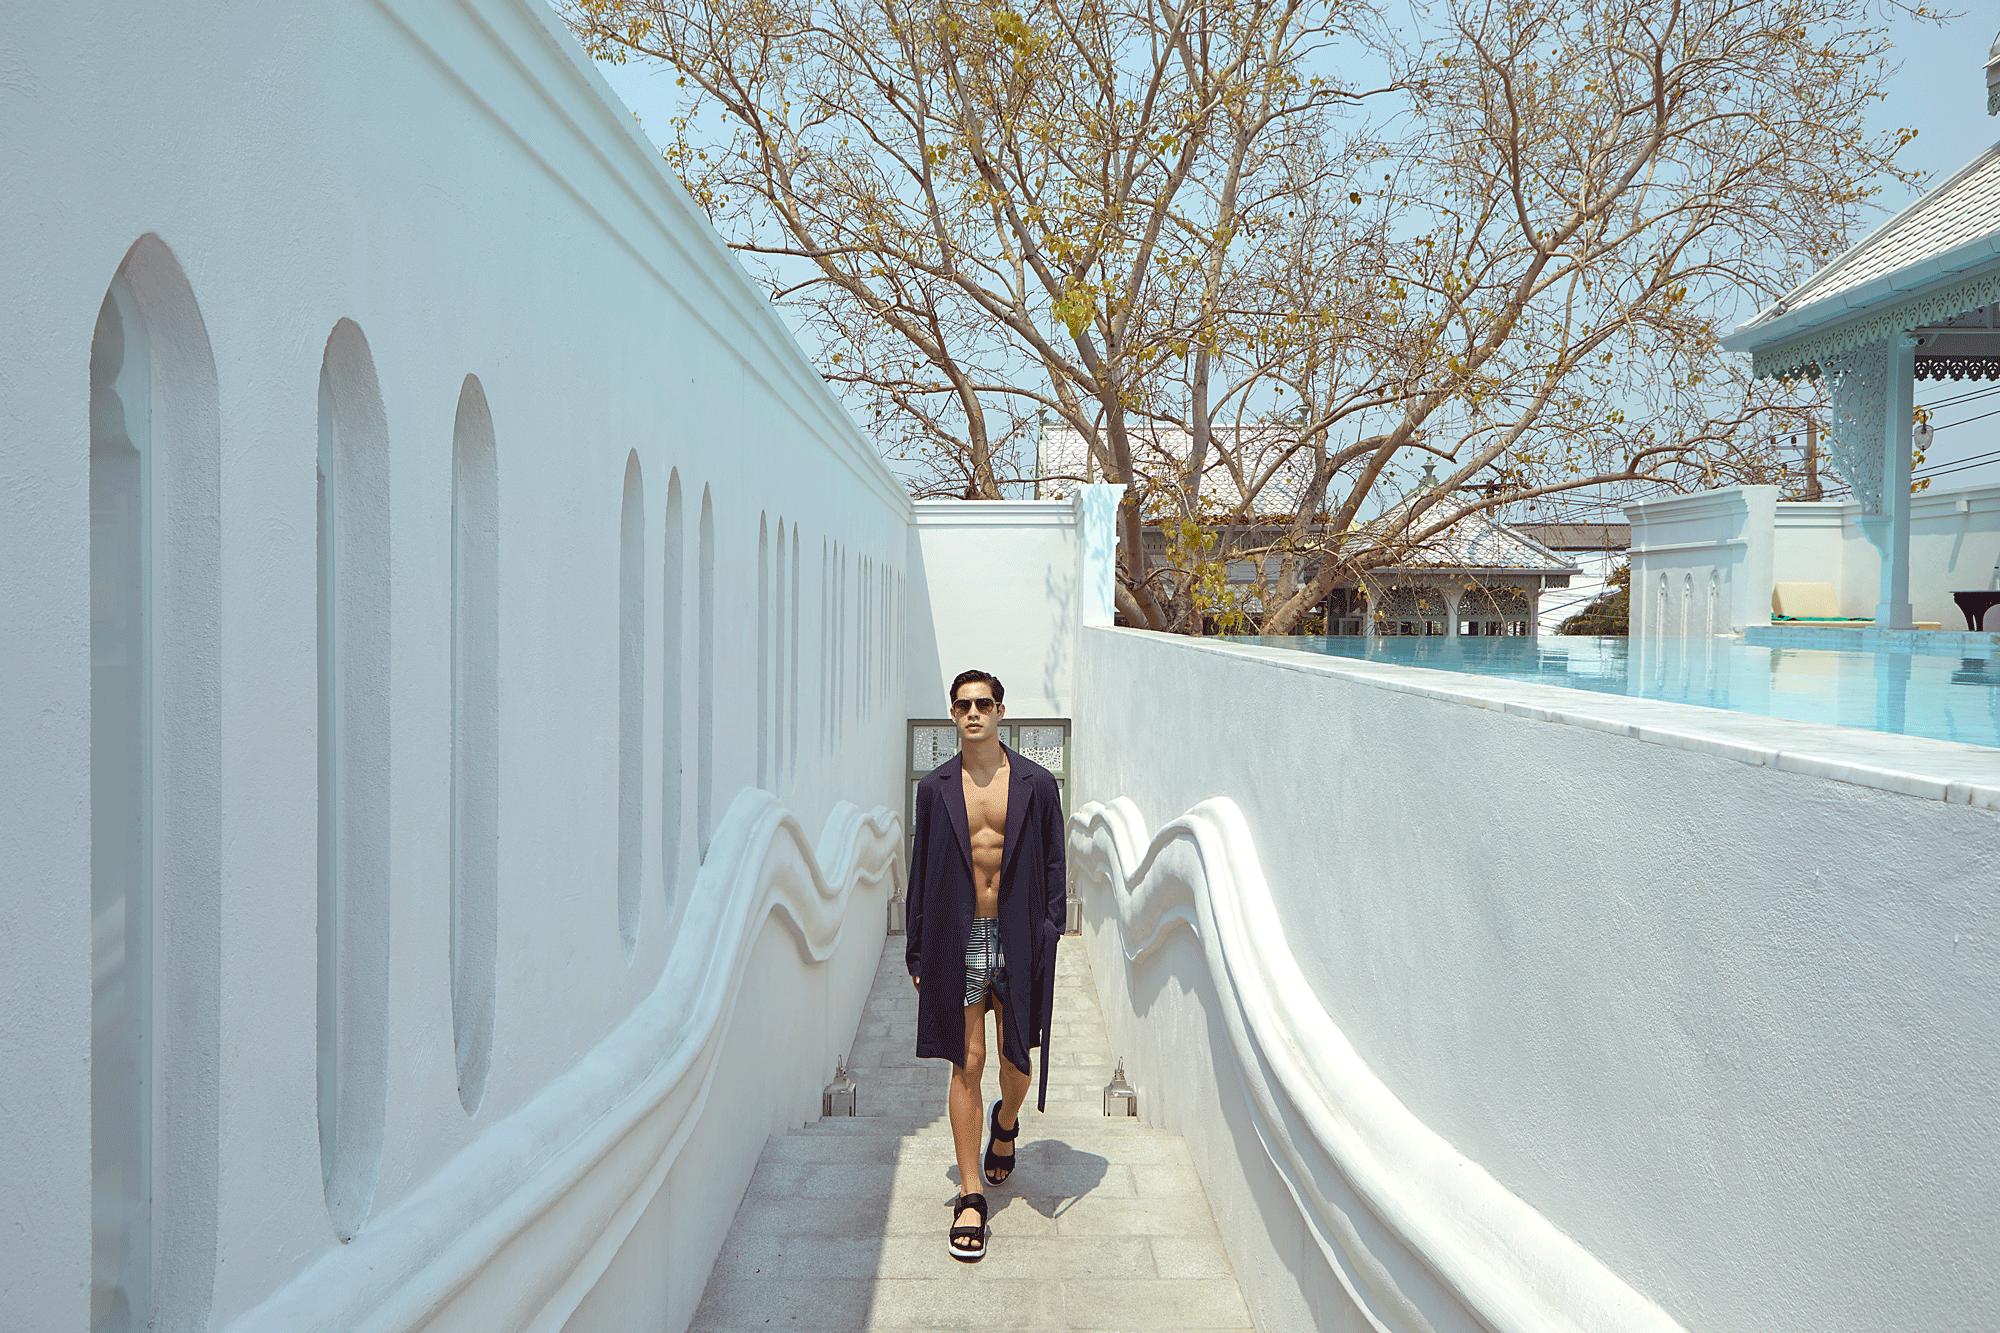 robe : SARIT / trunks : TIMO / sunglasses : Blake Kuwahara